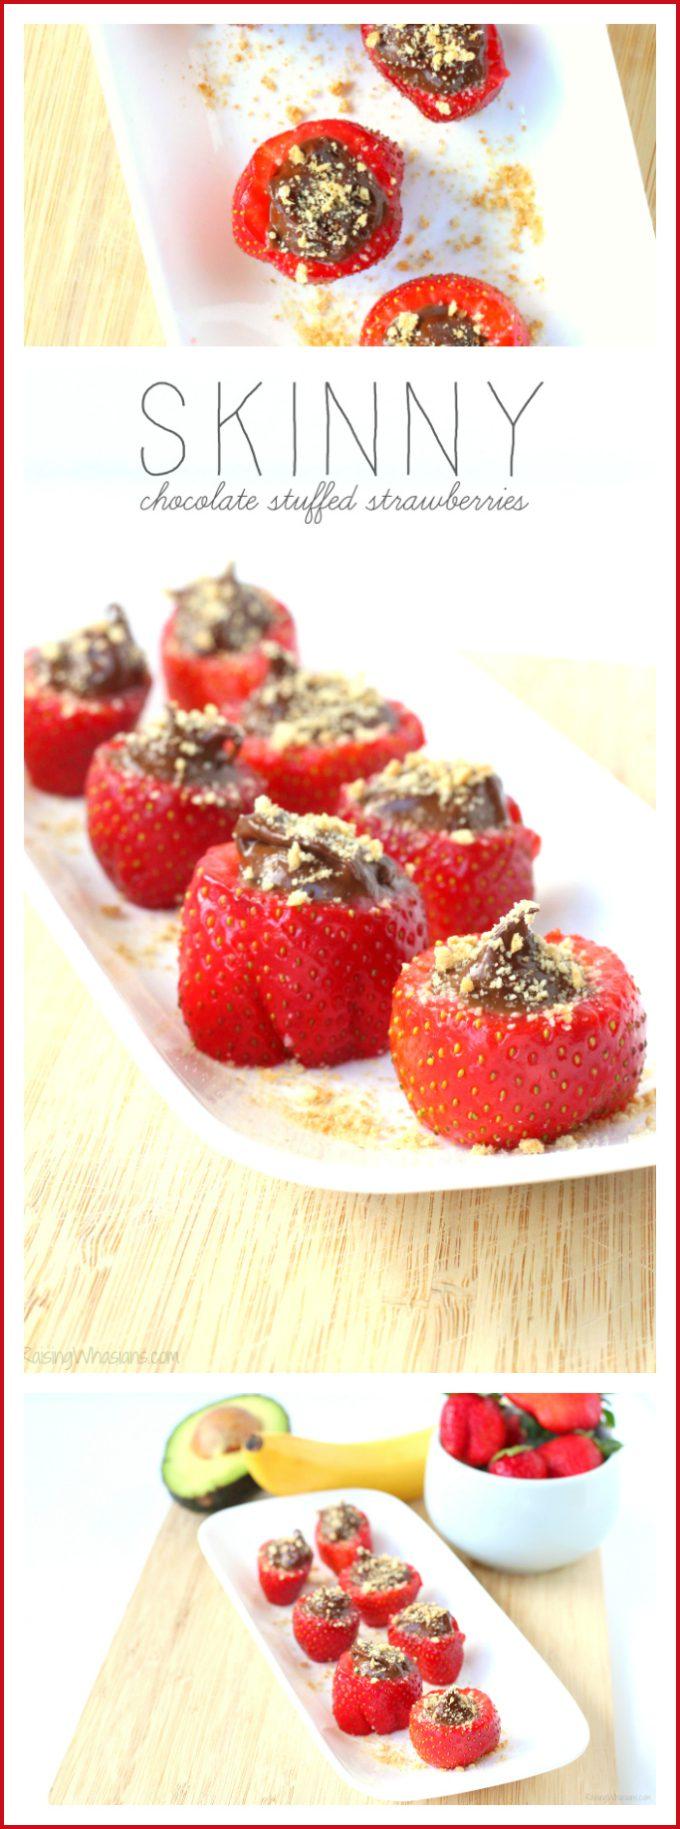 Skinny chocolate stuffed strawberries pinterest